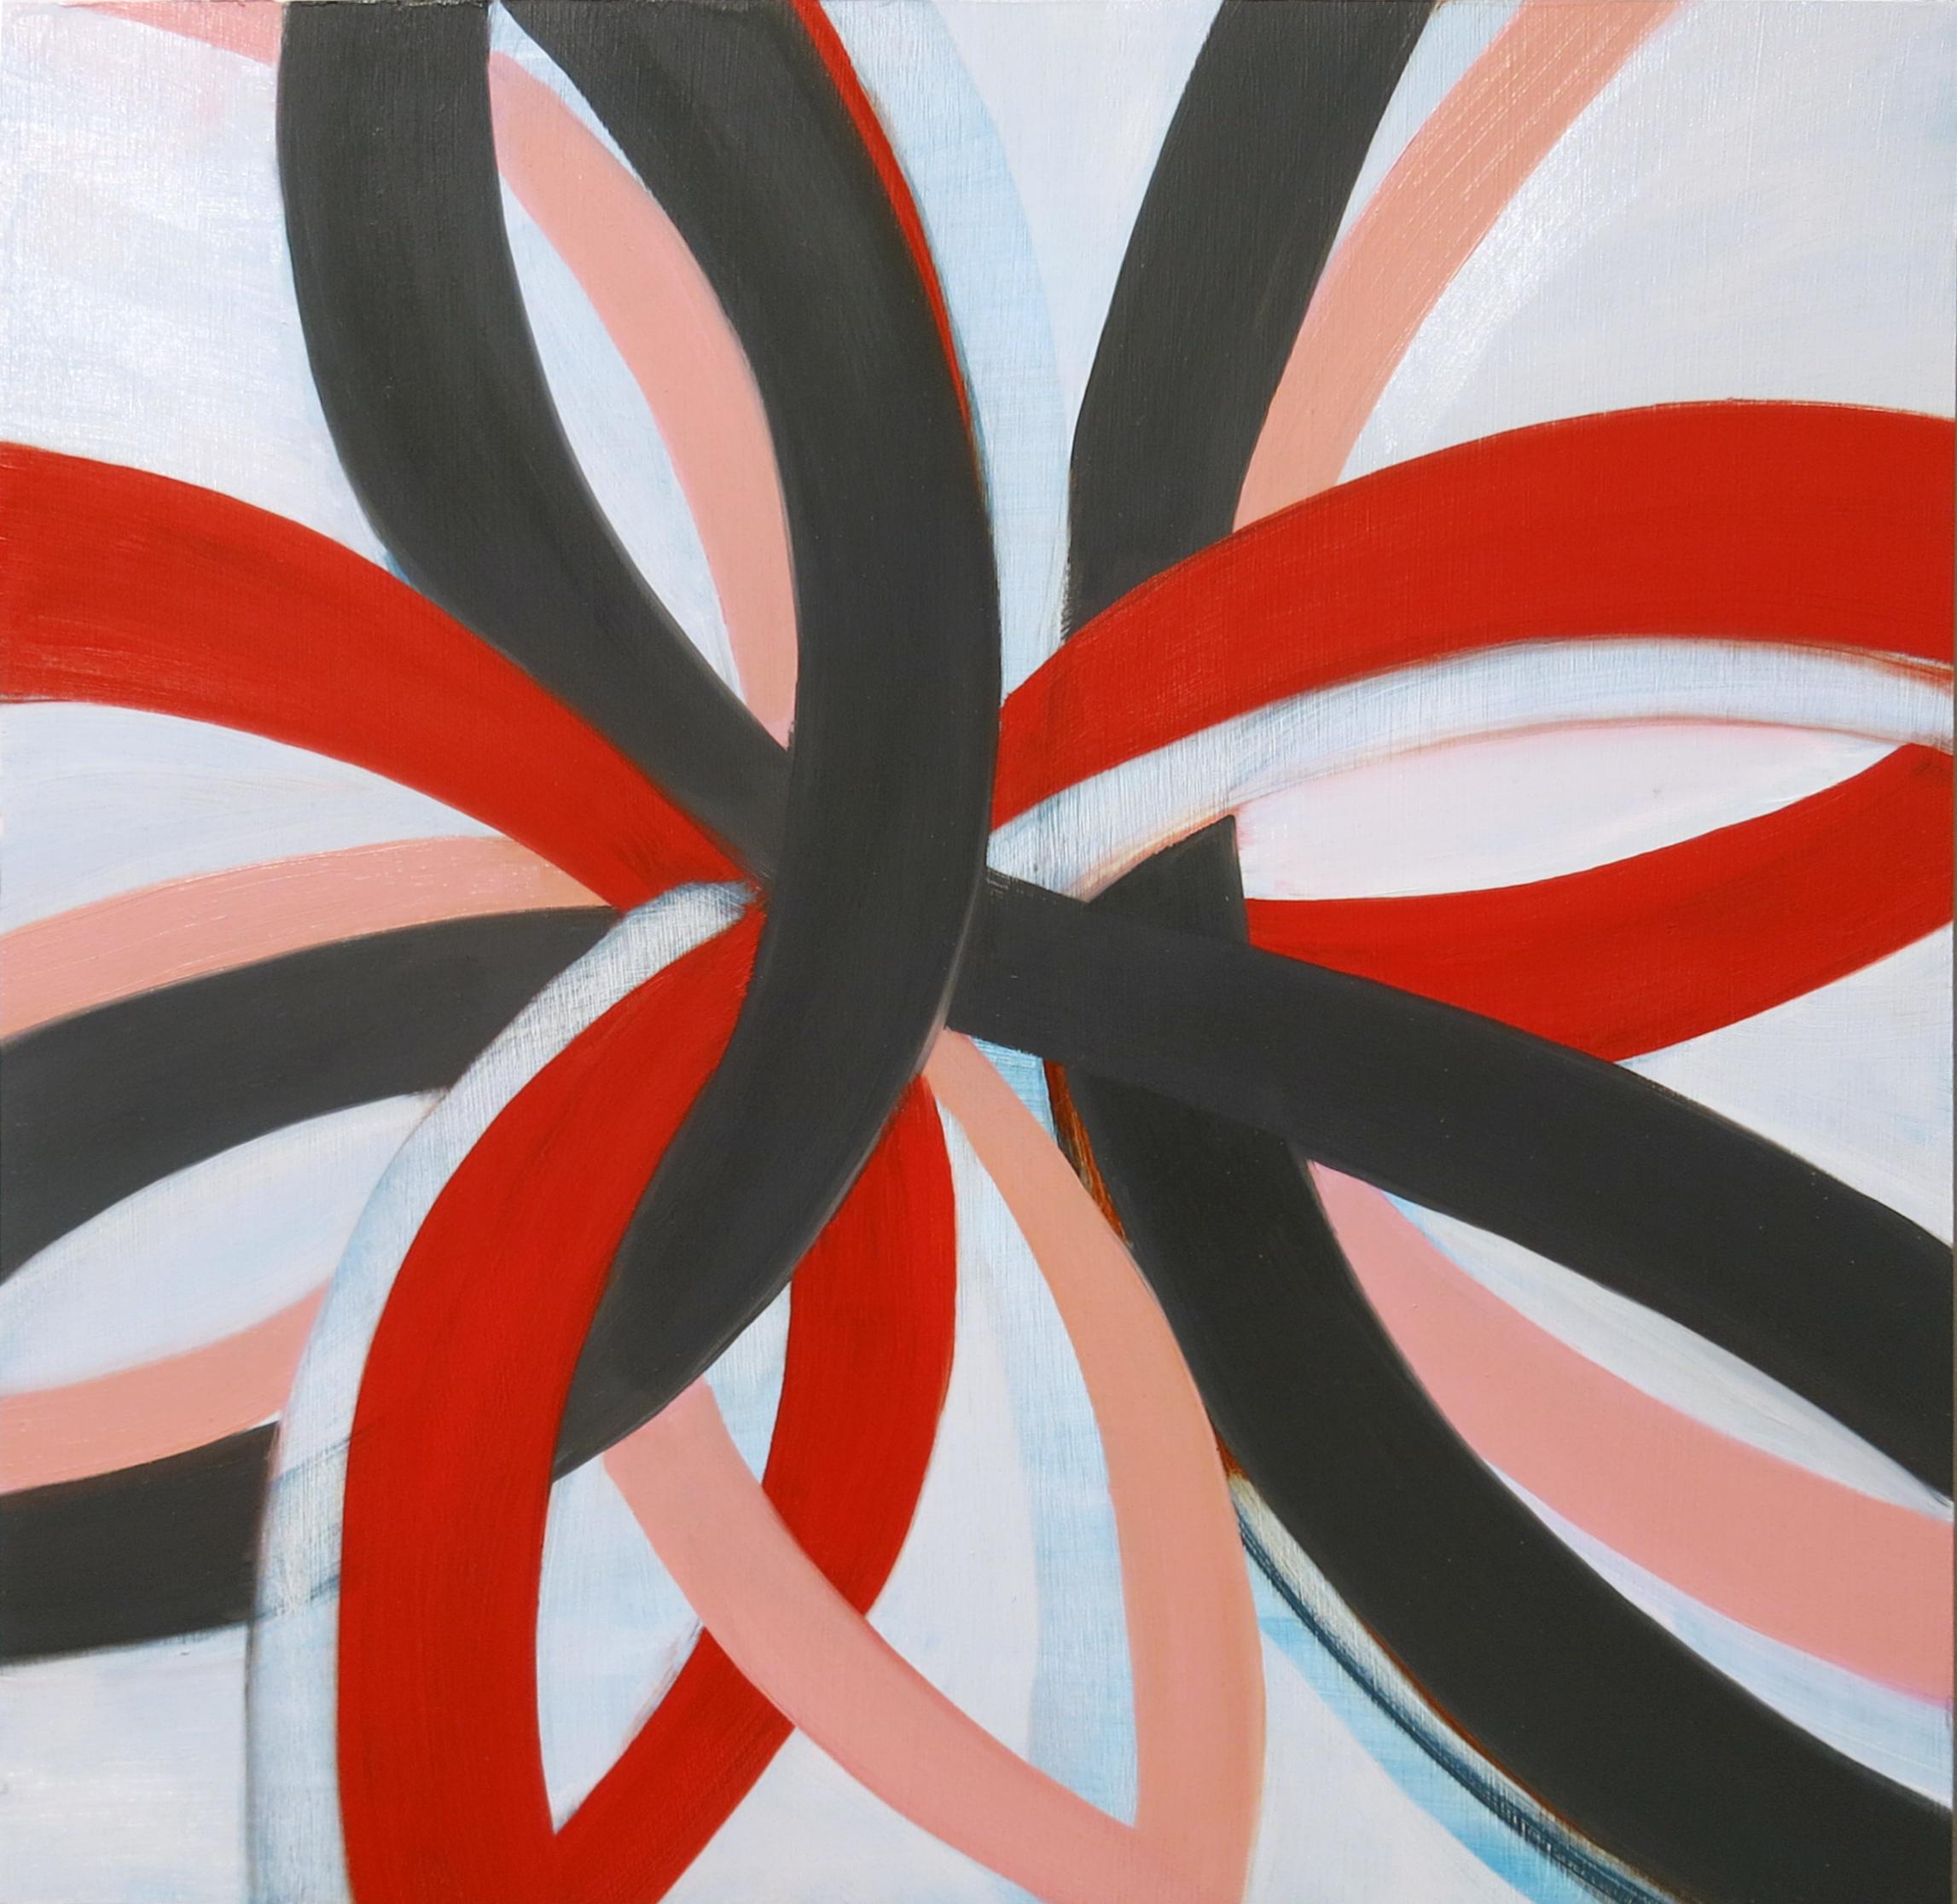 Jenifer Kobylarz, Perhaps, 2015, oil on panel, 12h x 12w in.